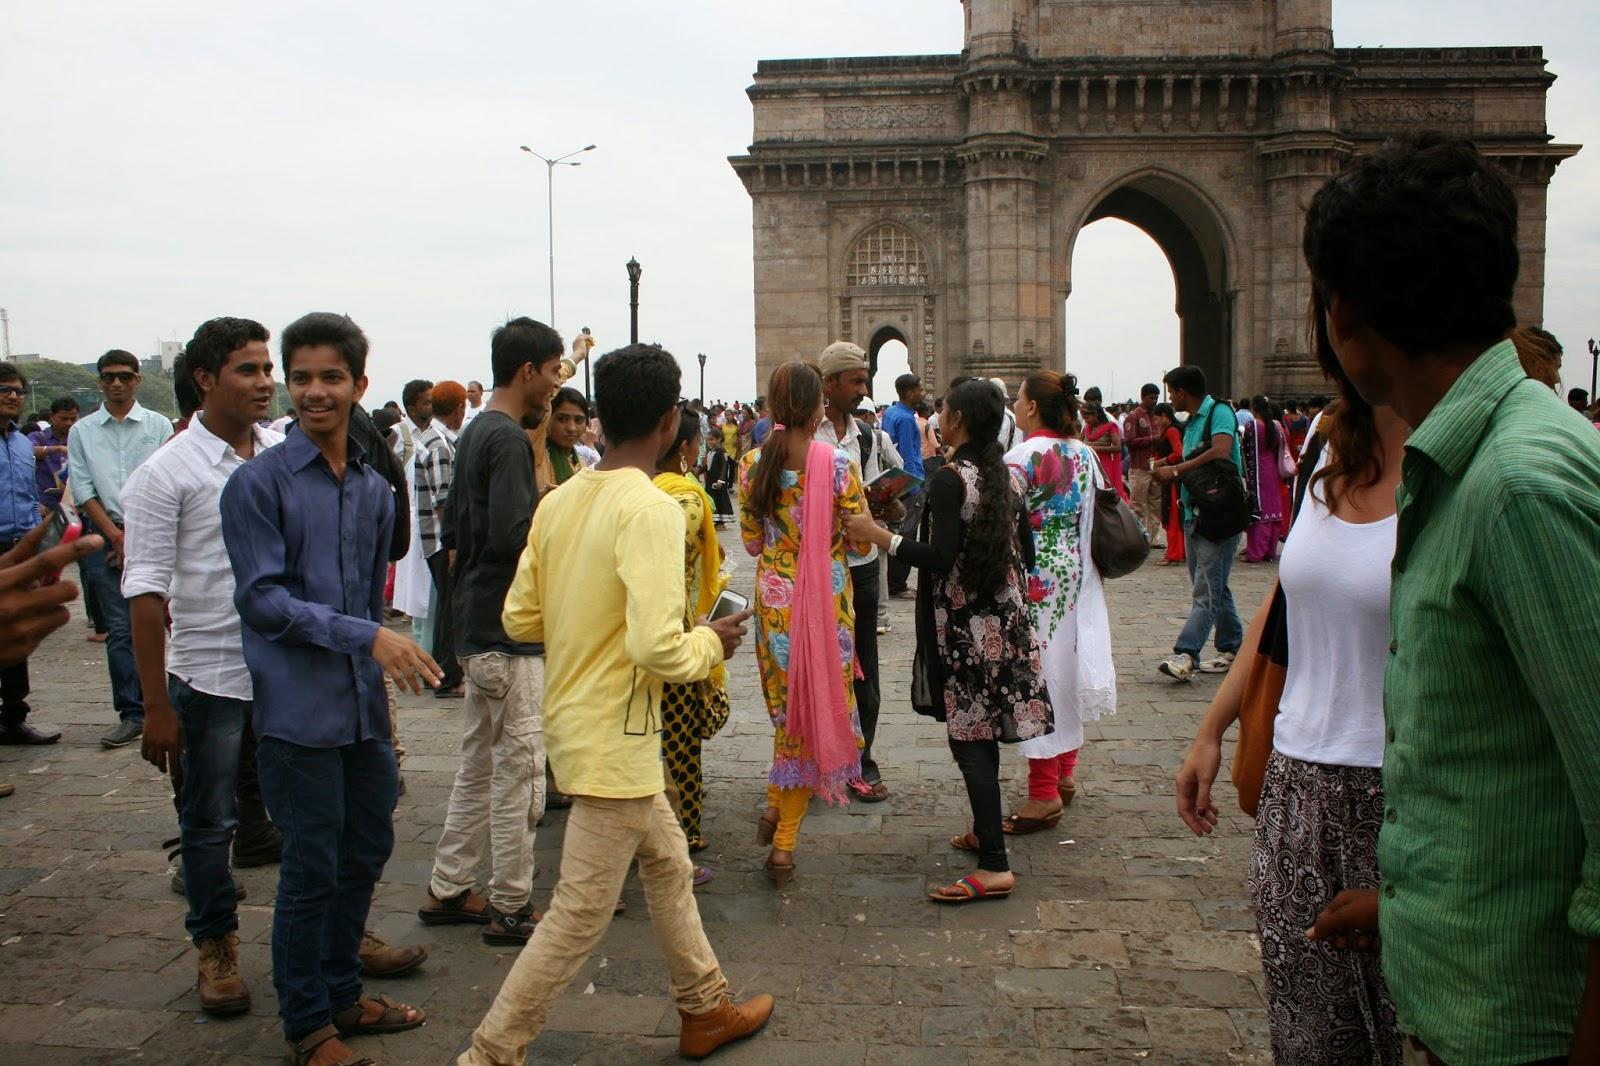 Puerta de la India en Bombay. Gateway of India in Mumbai